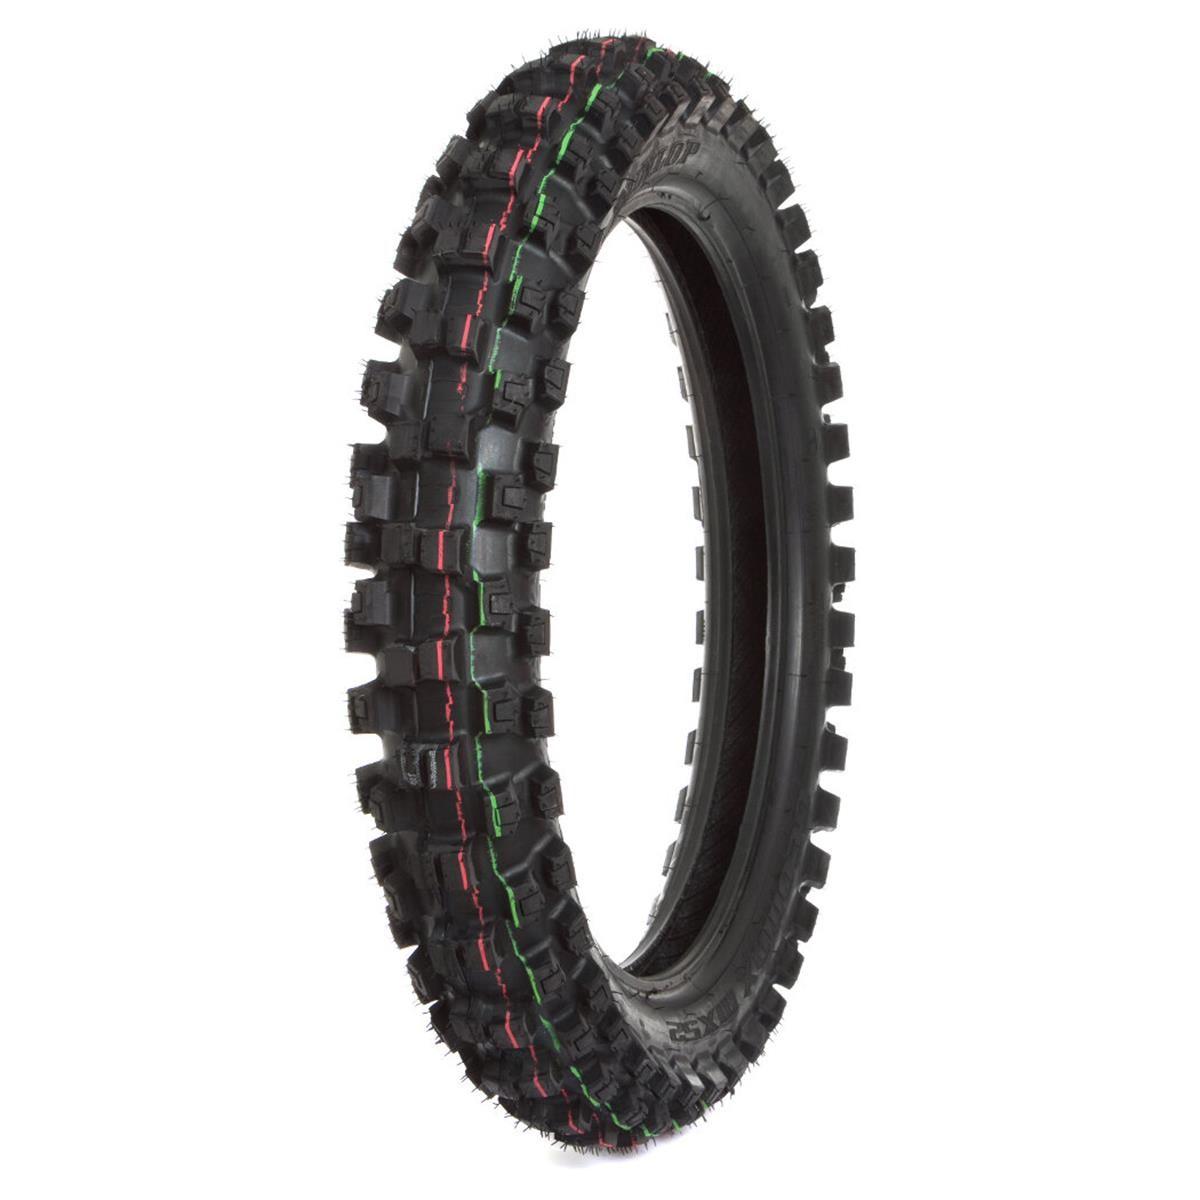 Dunlop Hinterradreifen Geomax MX52 Motocross 110/90-19